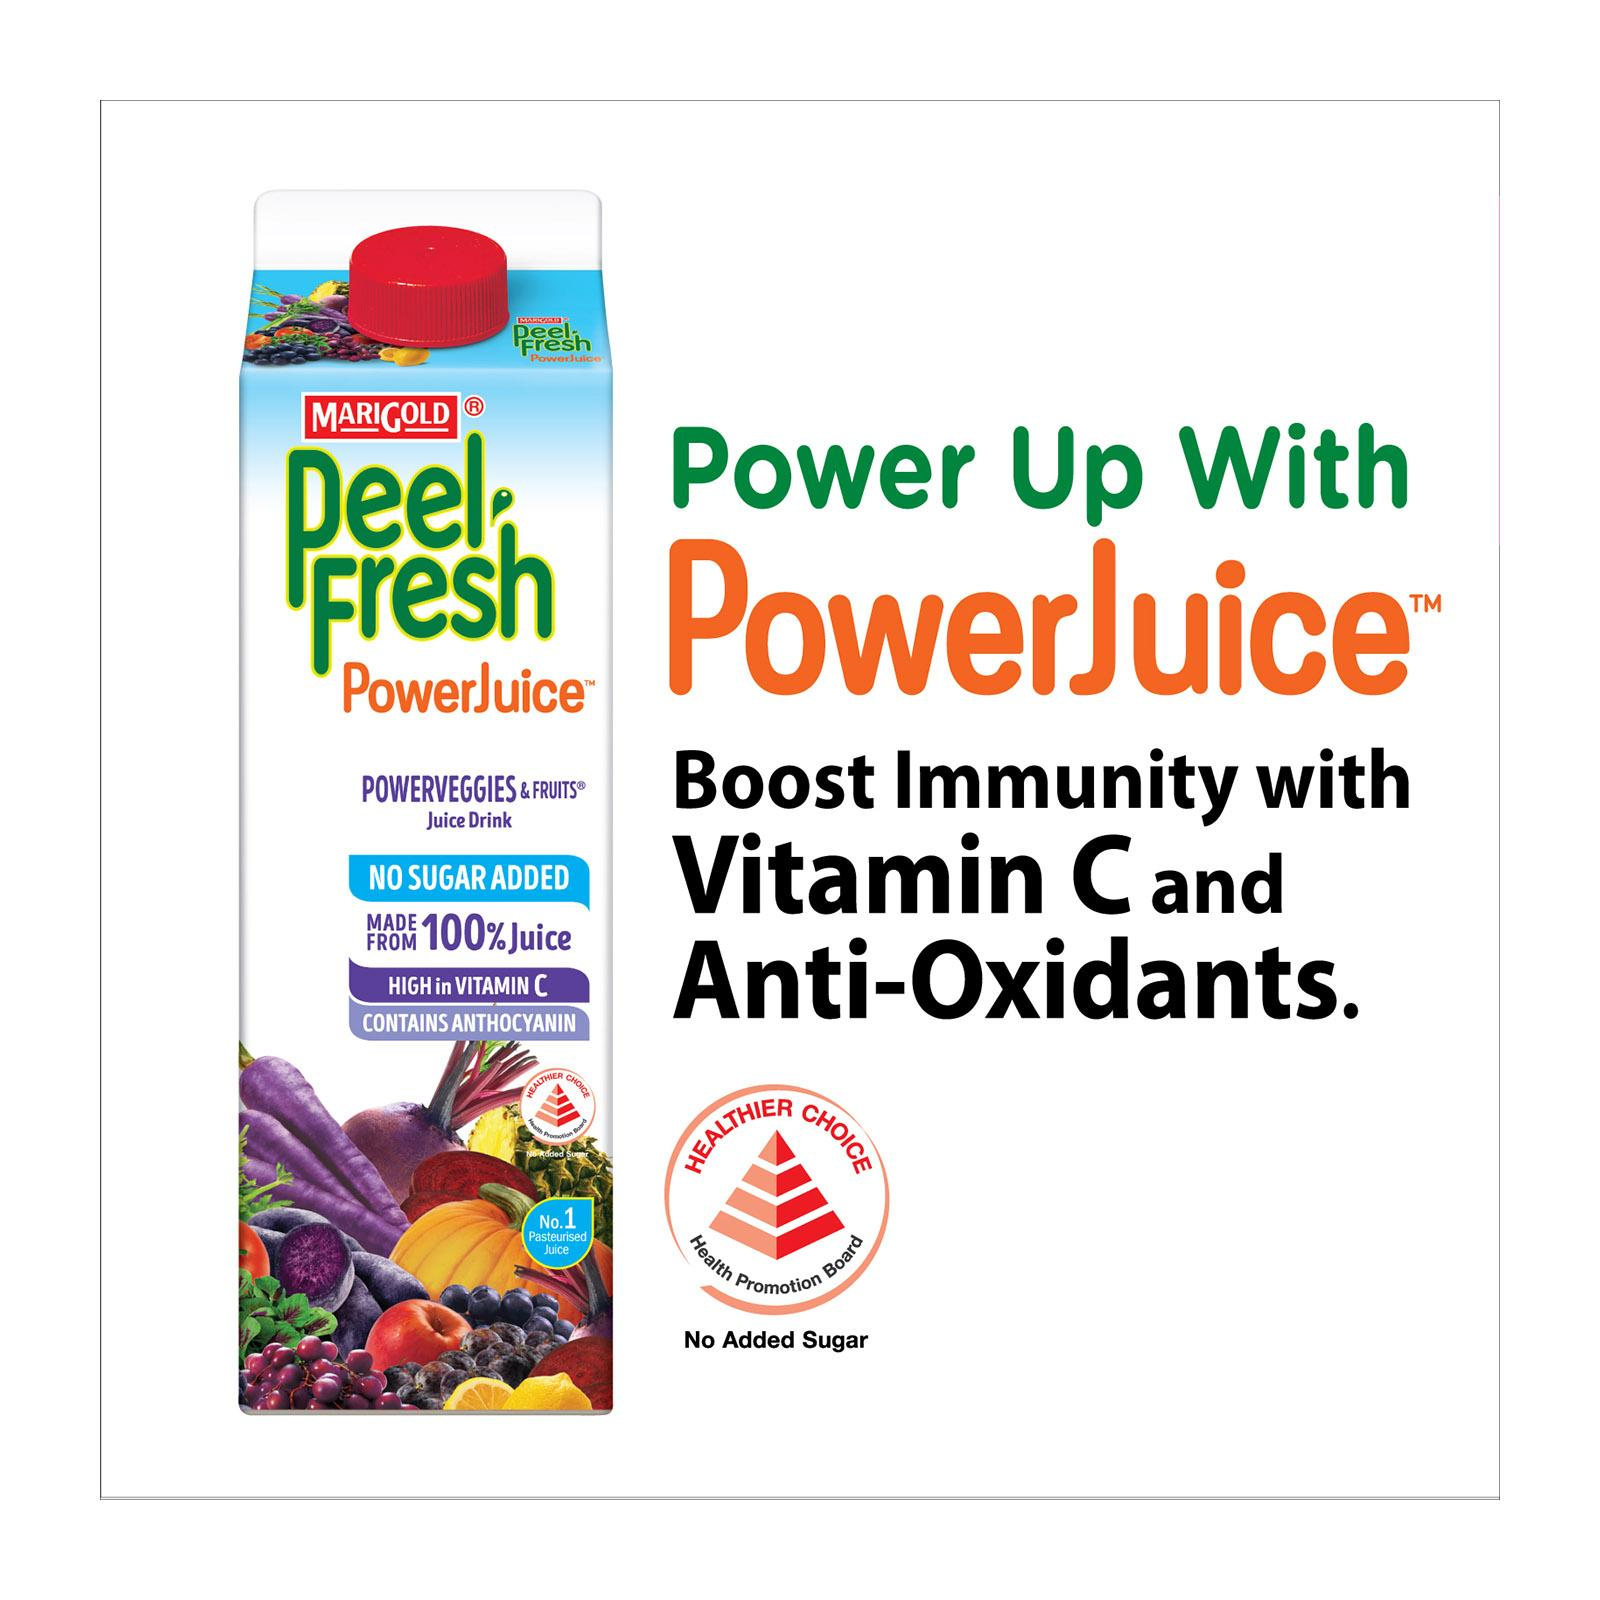 MARIGOLD Peel Fresh No Sugar Added Juice Drink - Powerveggies and Mixed Fruits